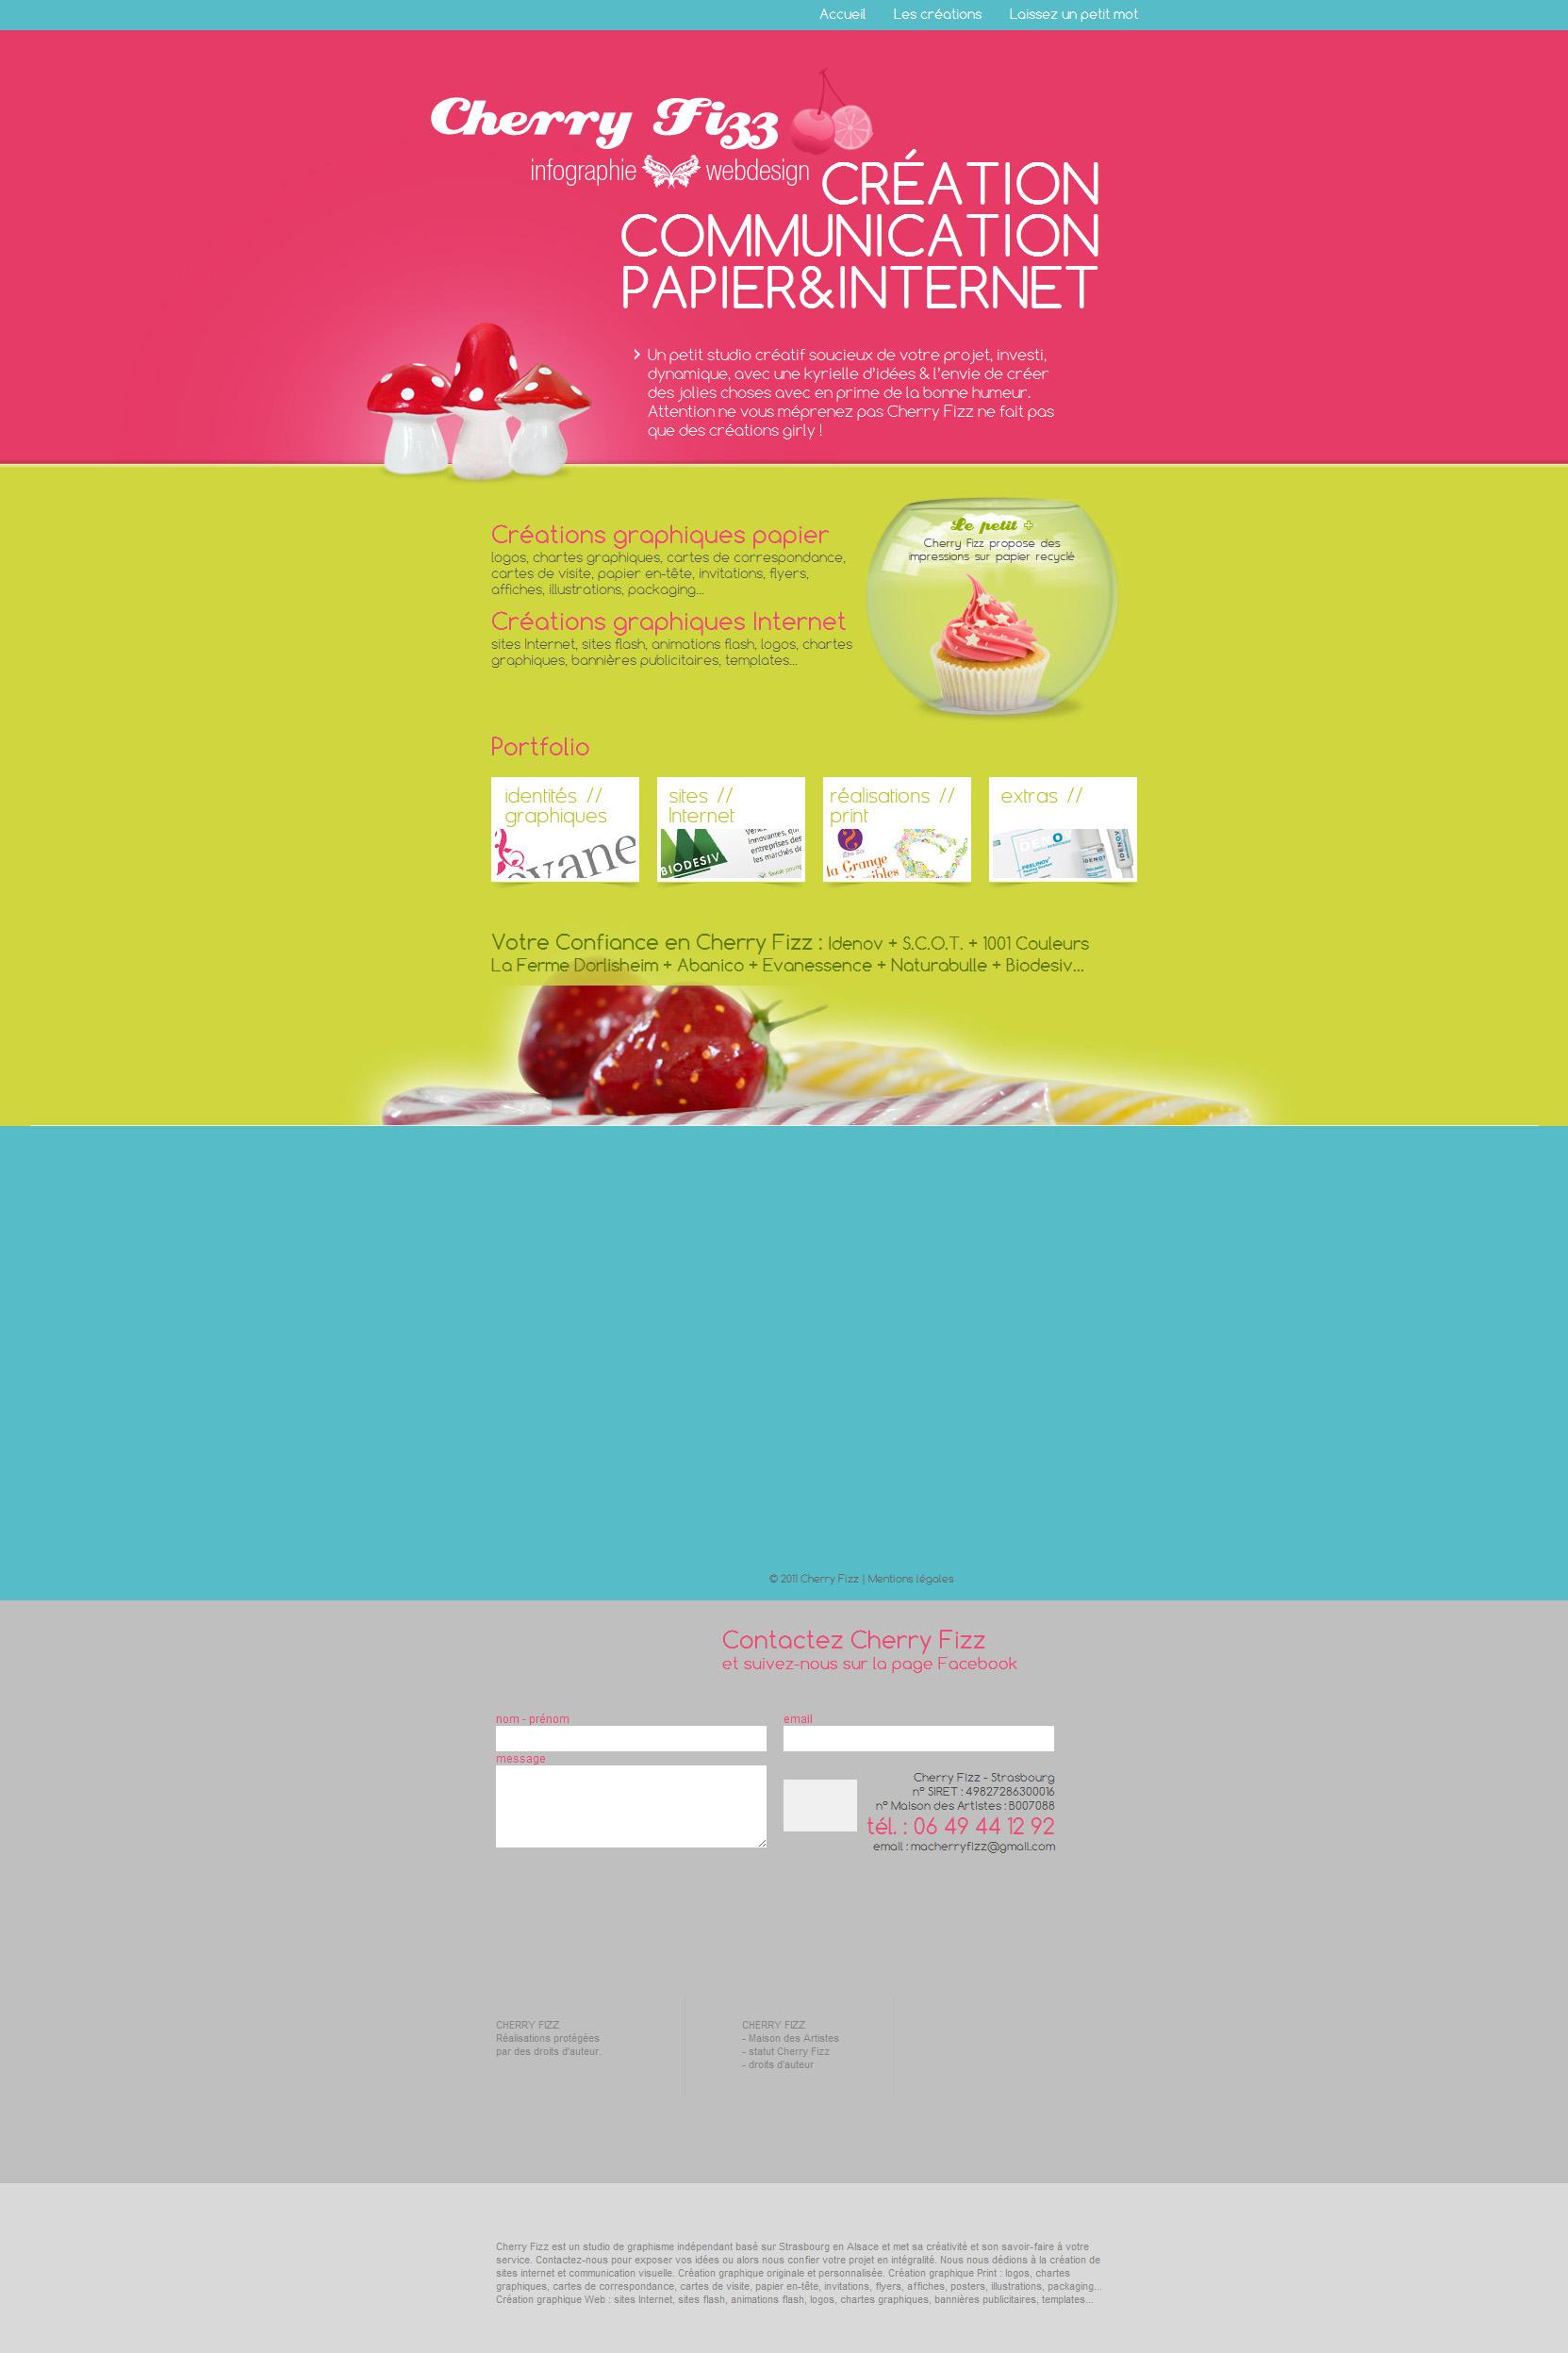 Cherryfizz Website Screenshot